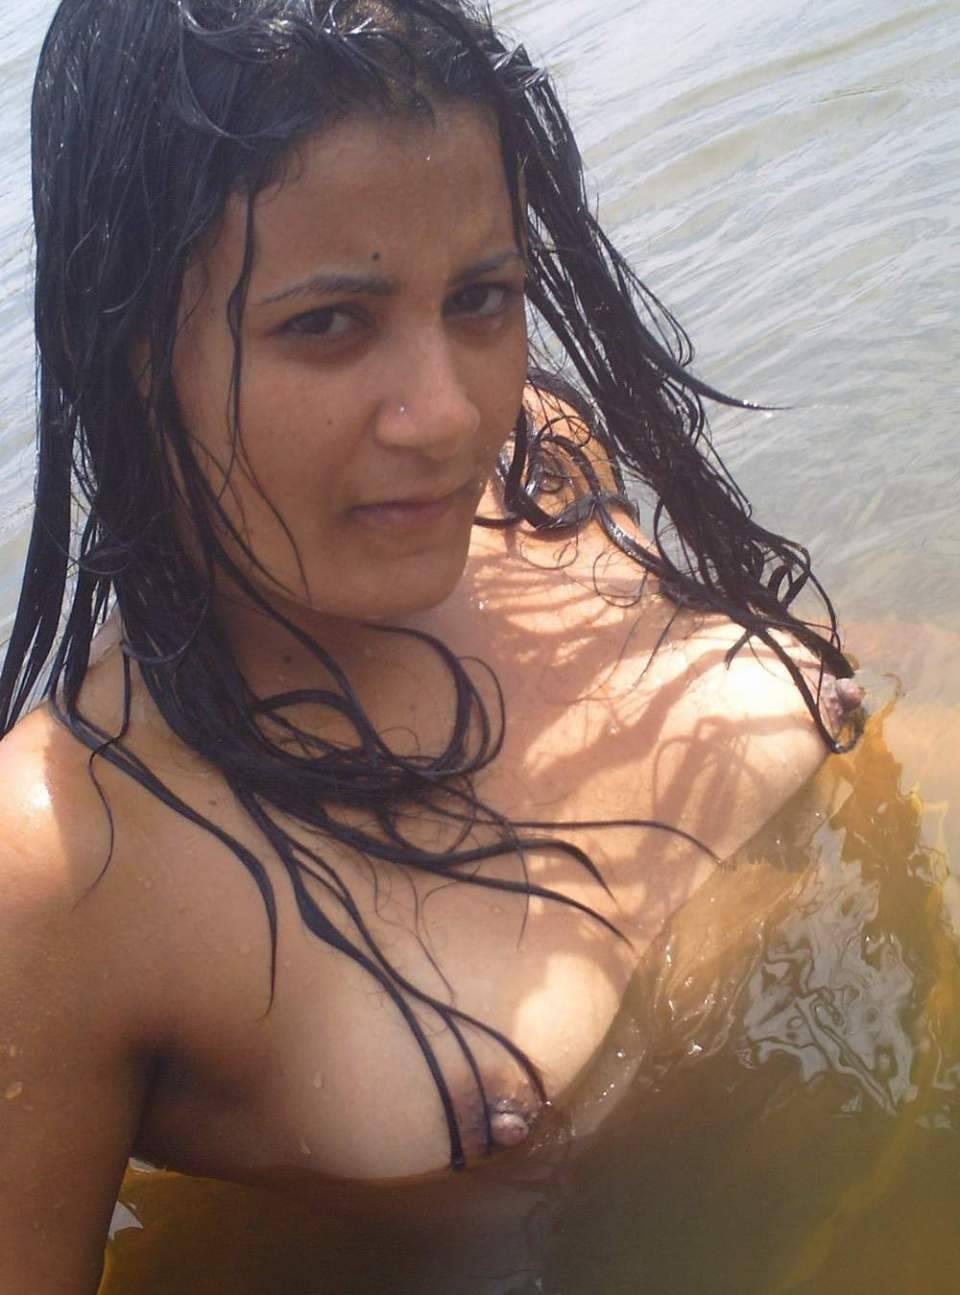 Hotgirlspussyimages porn lady